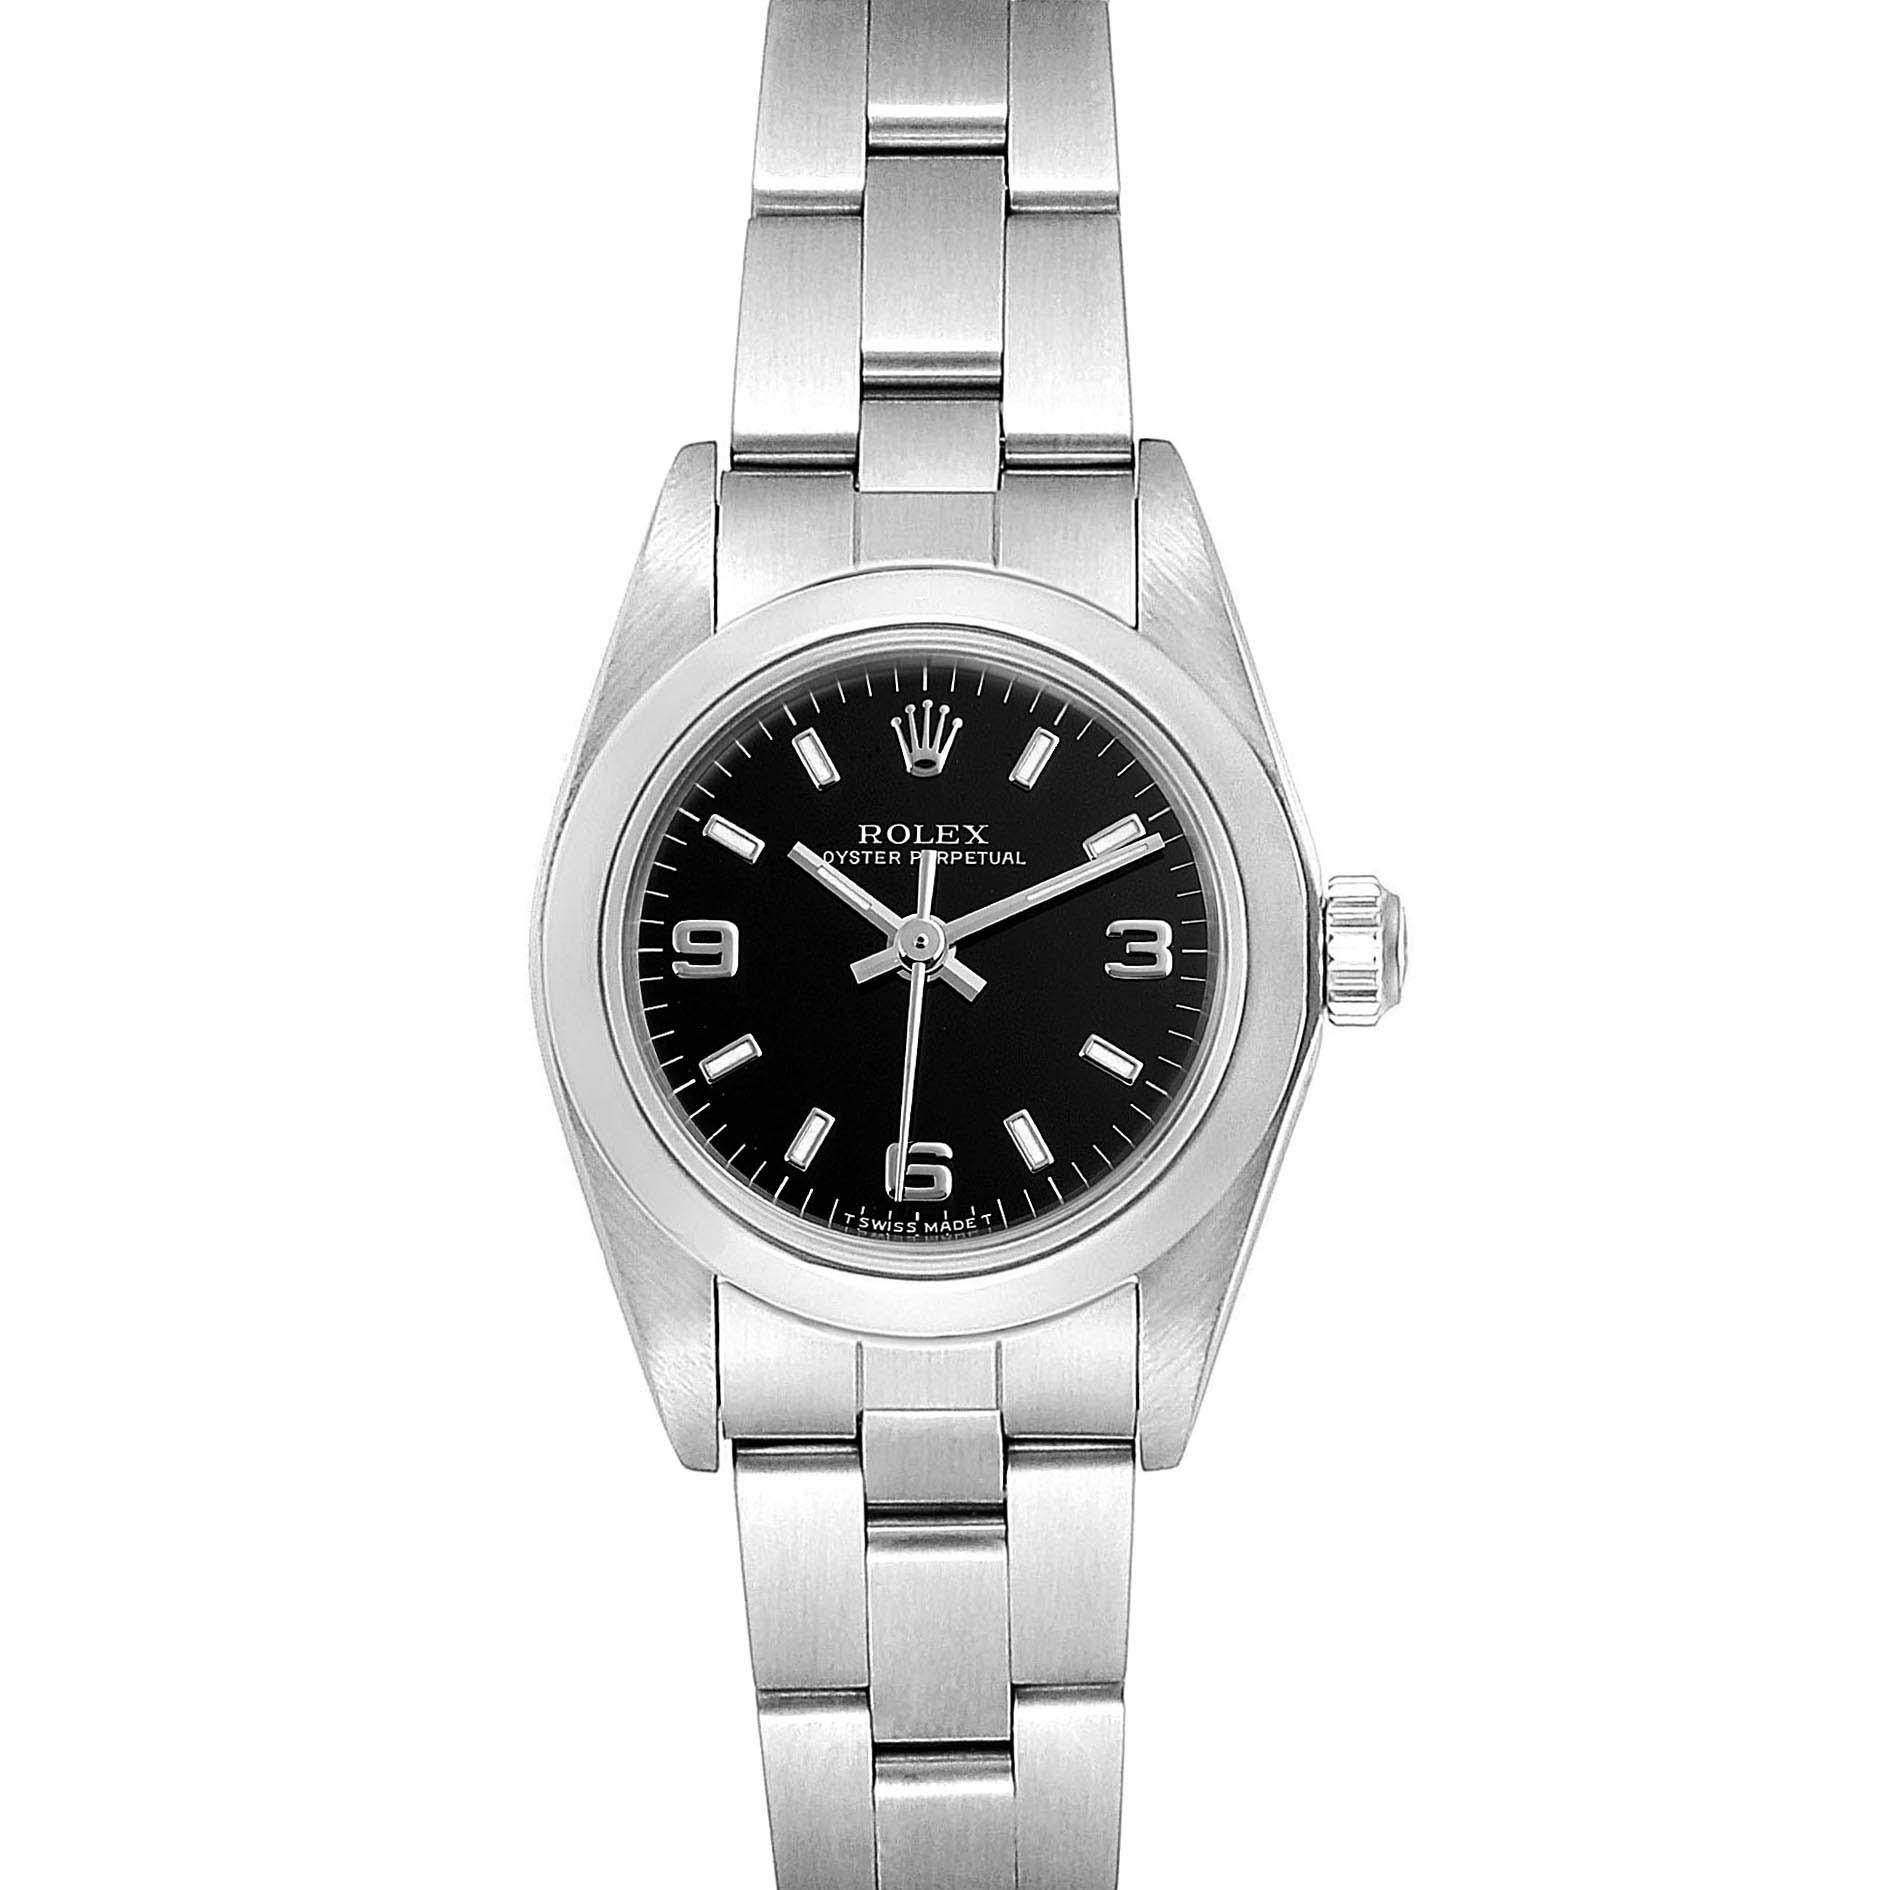 Rolex Oyster Perpetual Nondate Steel Black Dial Ladies Watch 67180